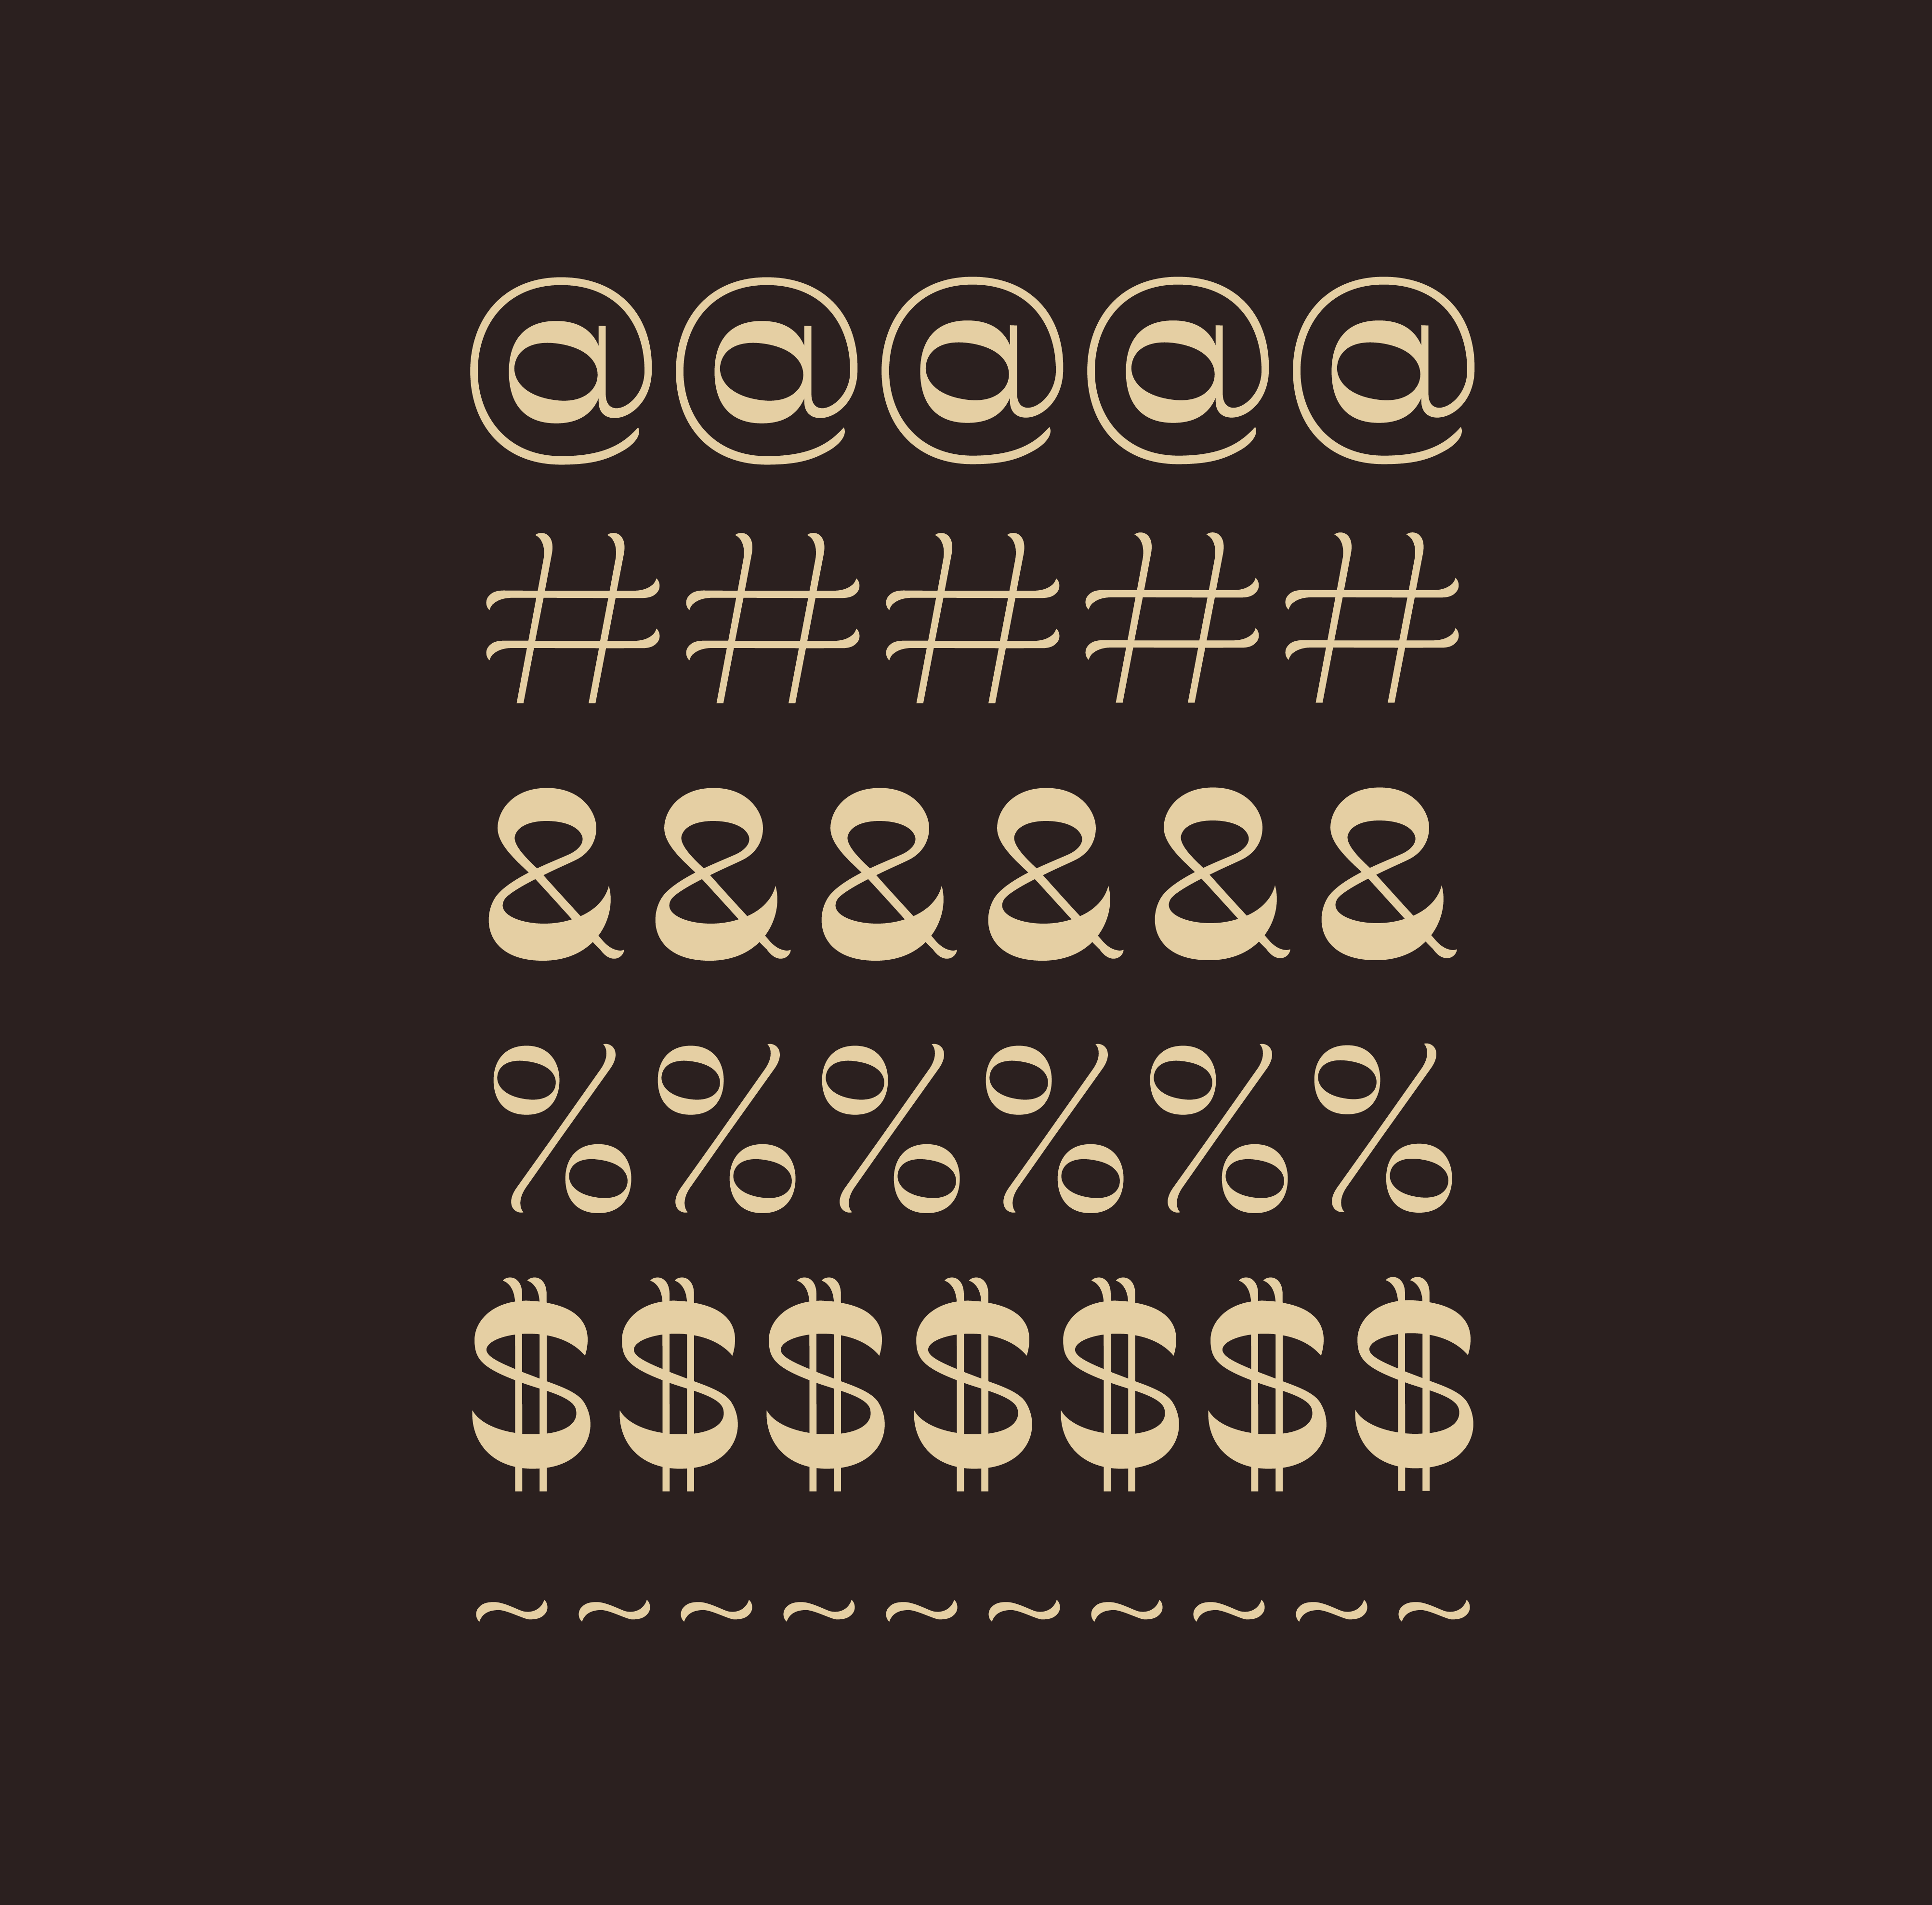 reverse-contrast-font-julia-gordon